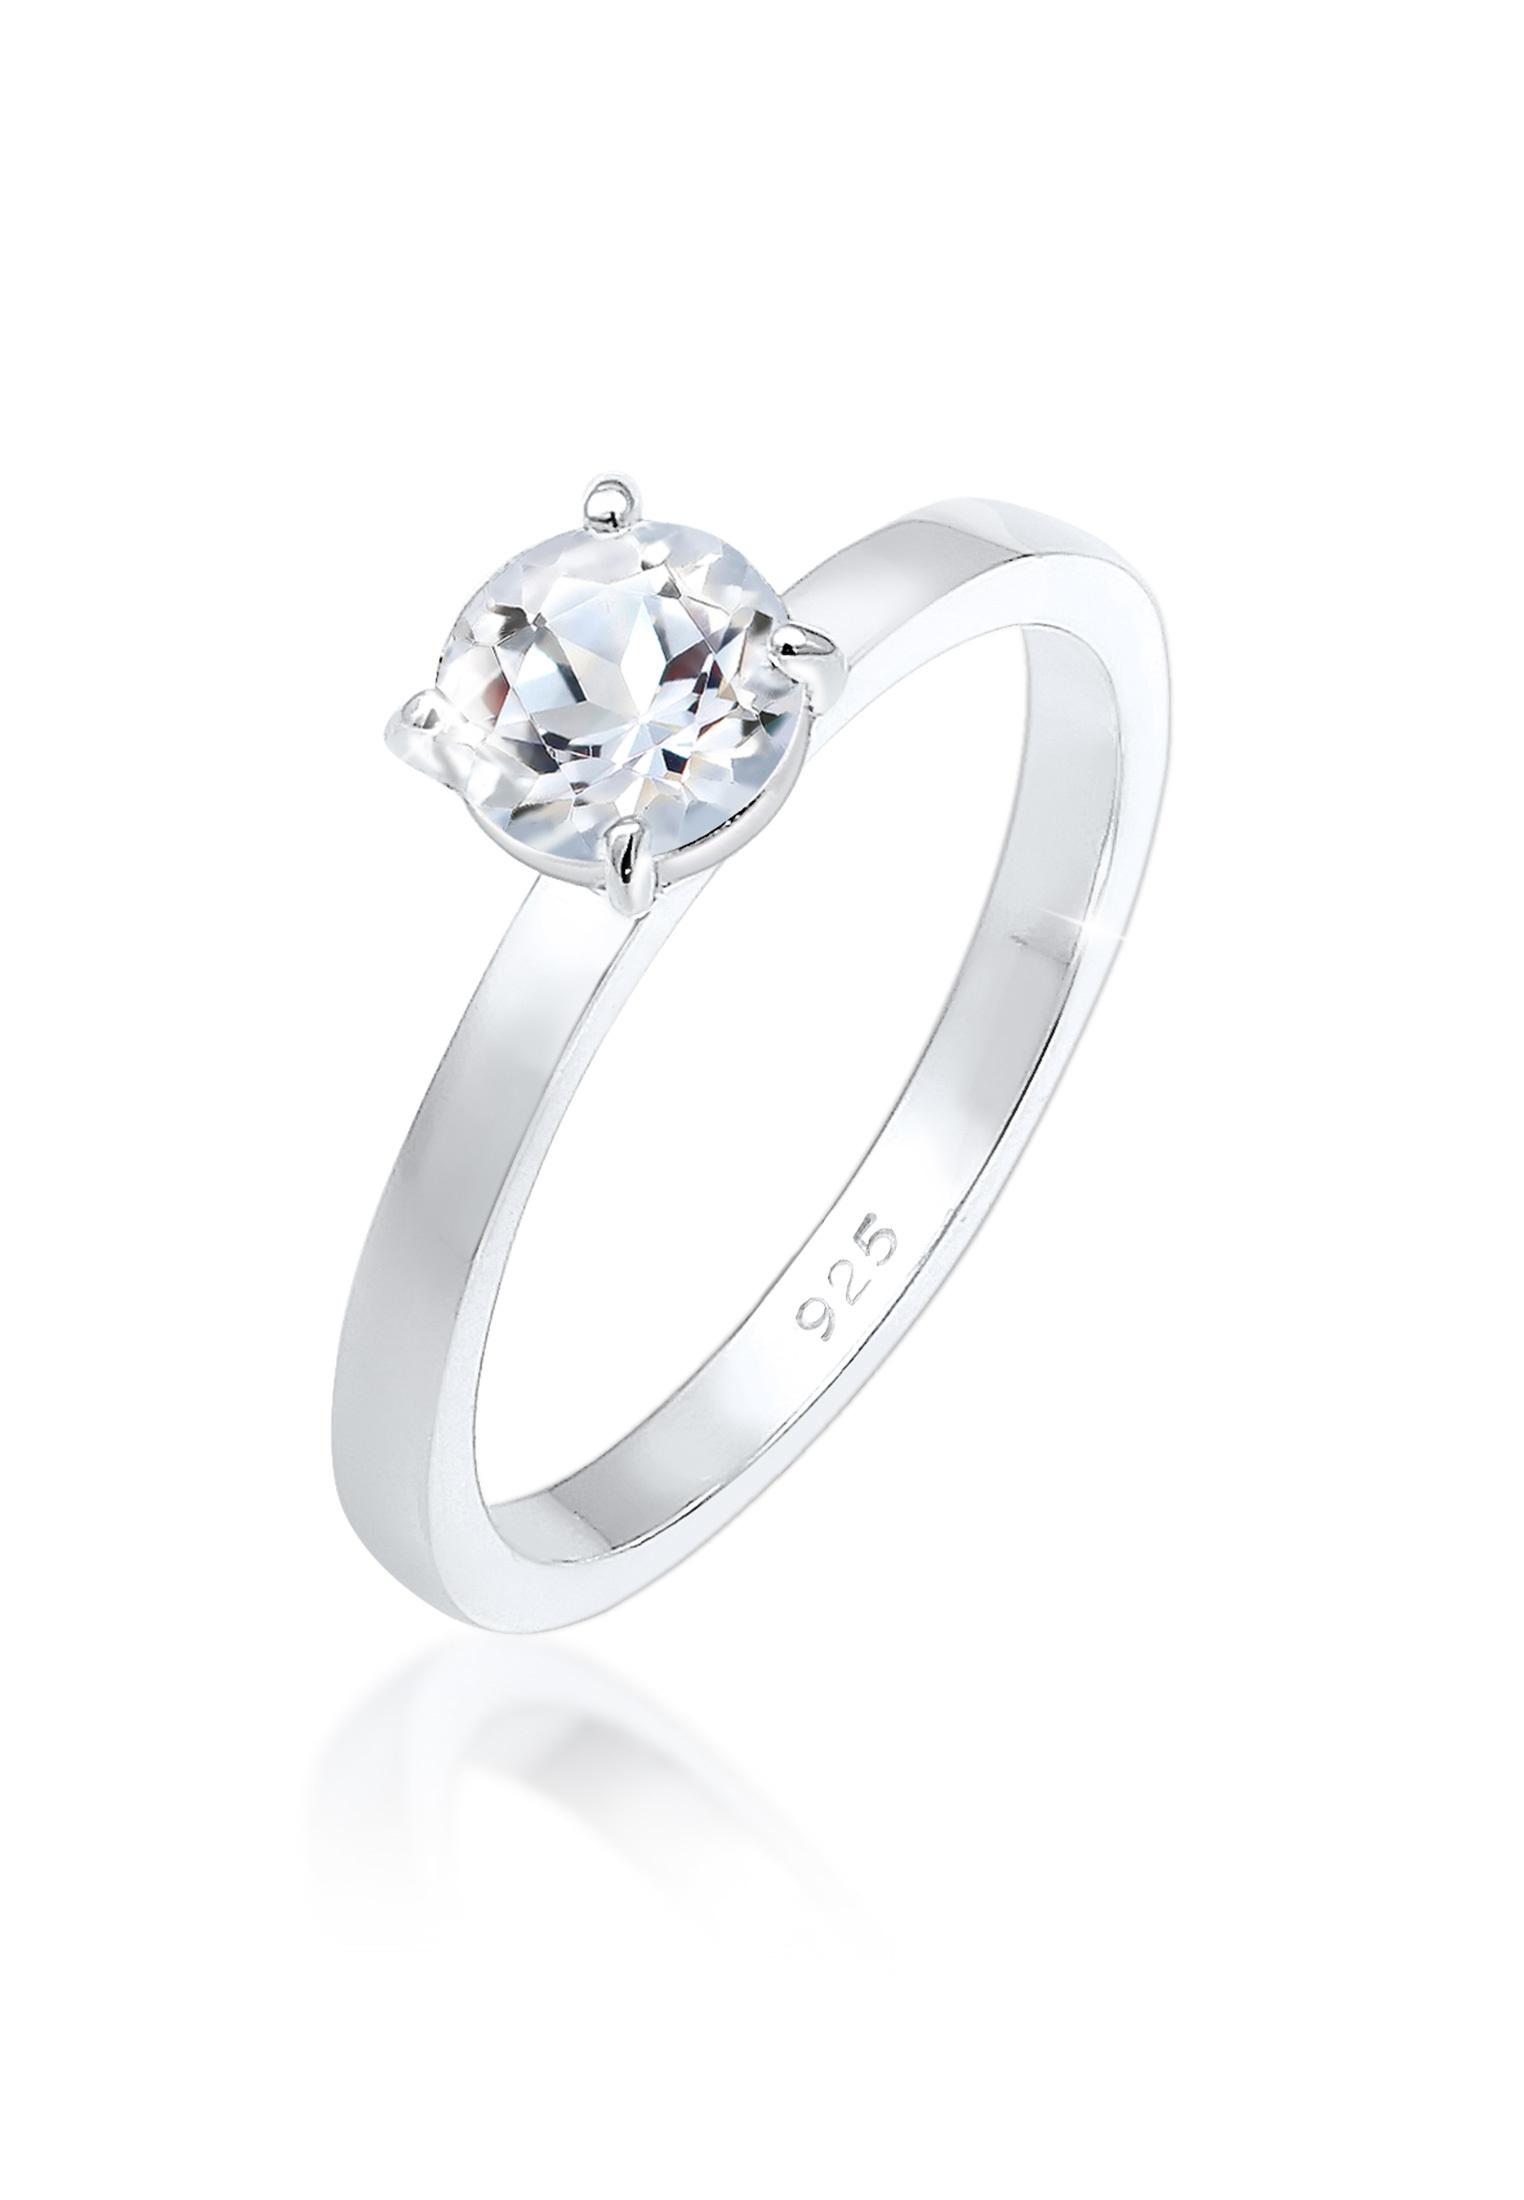 Verlobungsring   Topas ( Weiß )   925er Sterling Silber